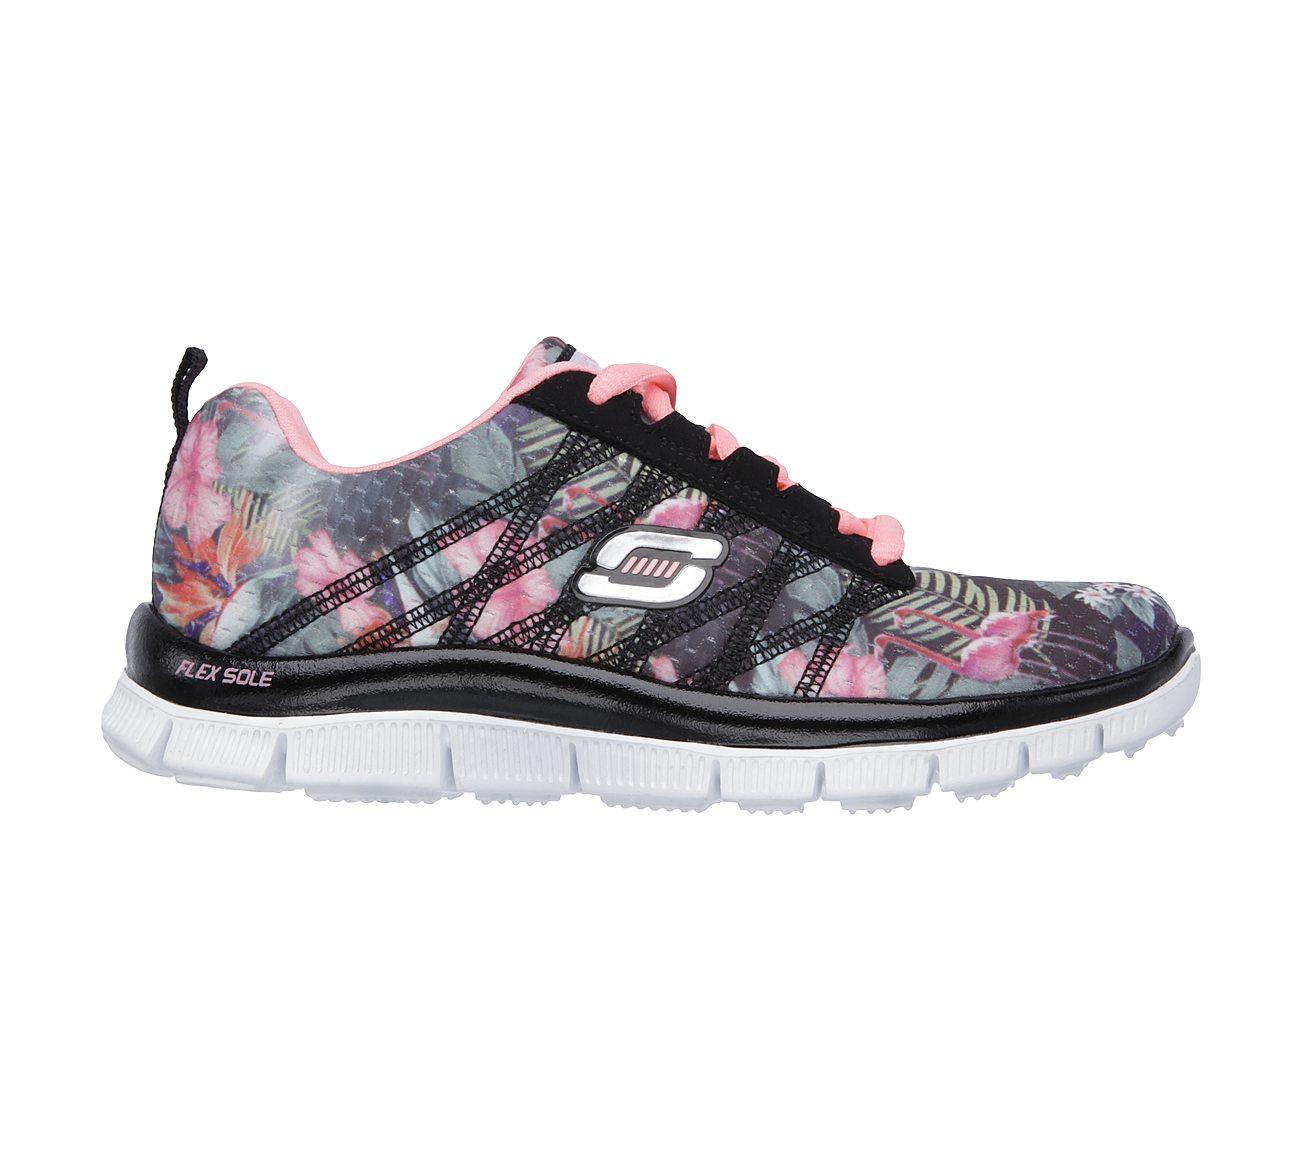 2dc62fc3e7d0 Buy SKECHERS Skech Appeal - Floral Bloom SKECHERS Sport Shoes only ...